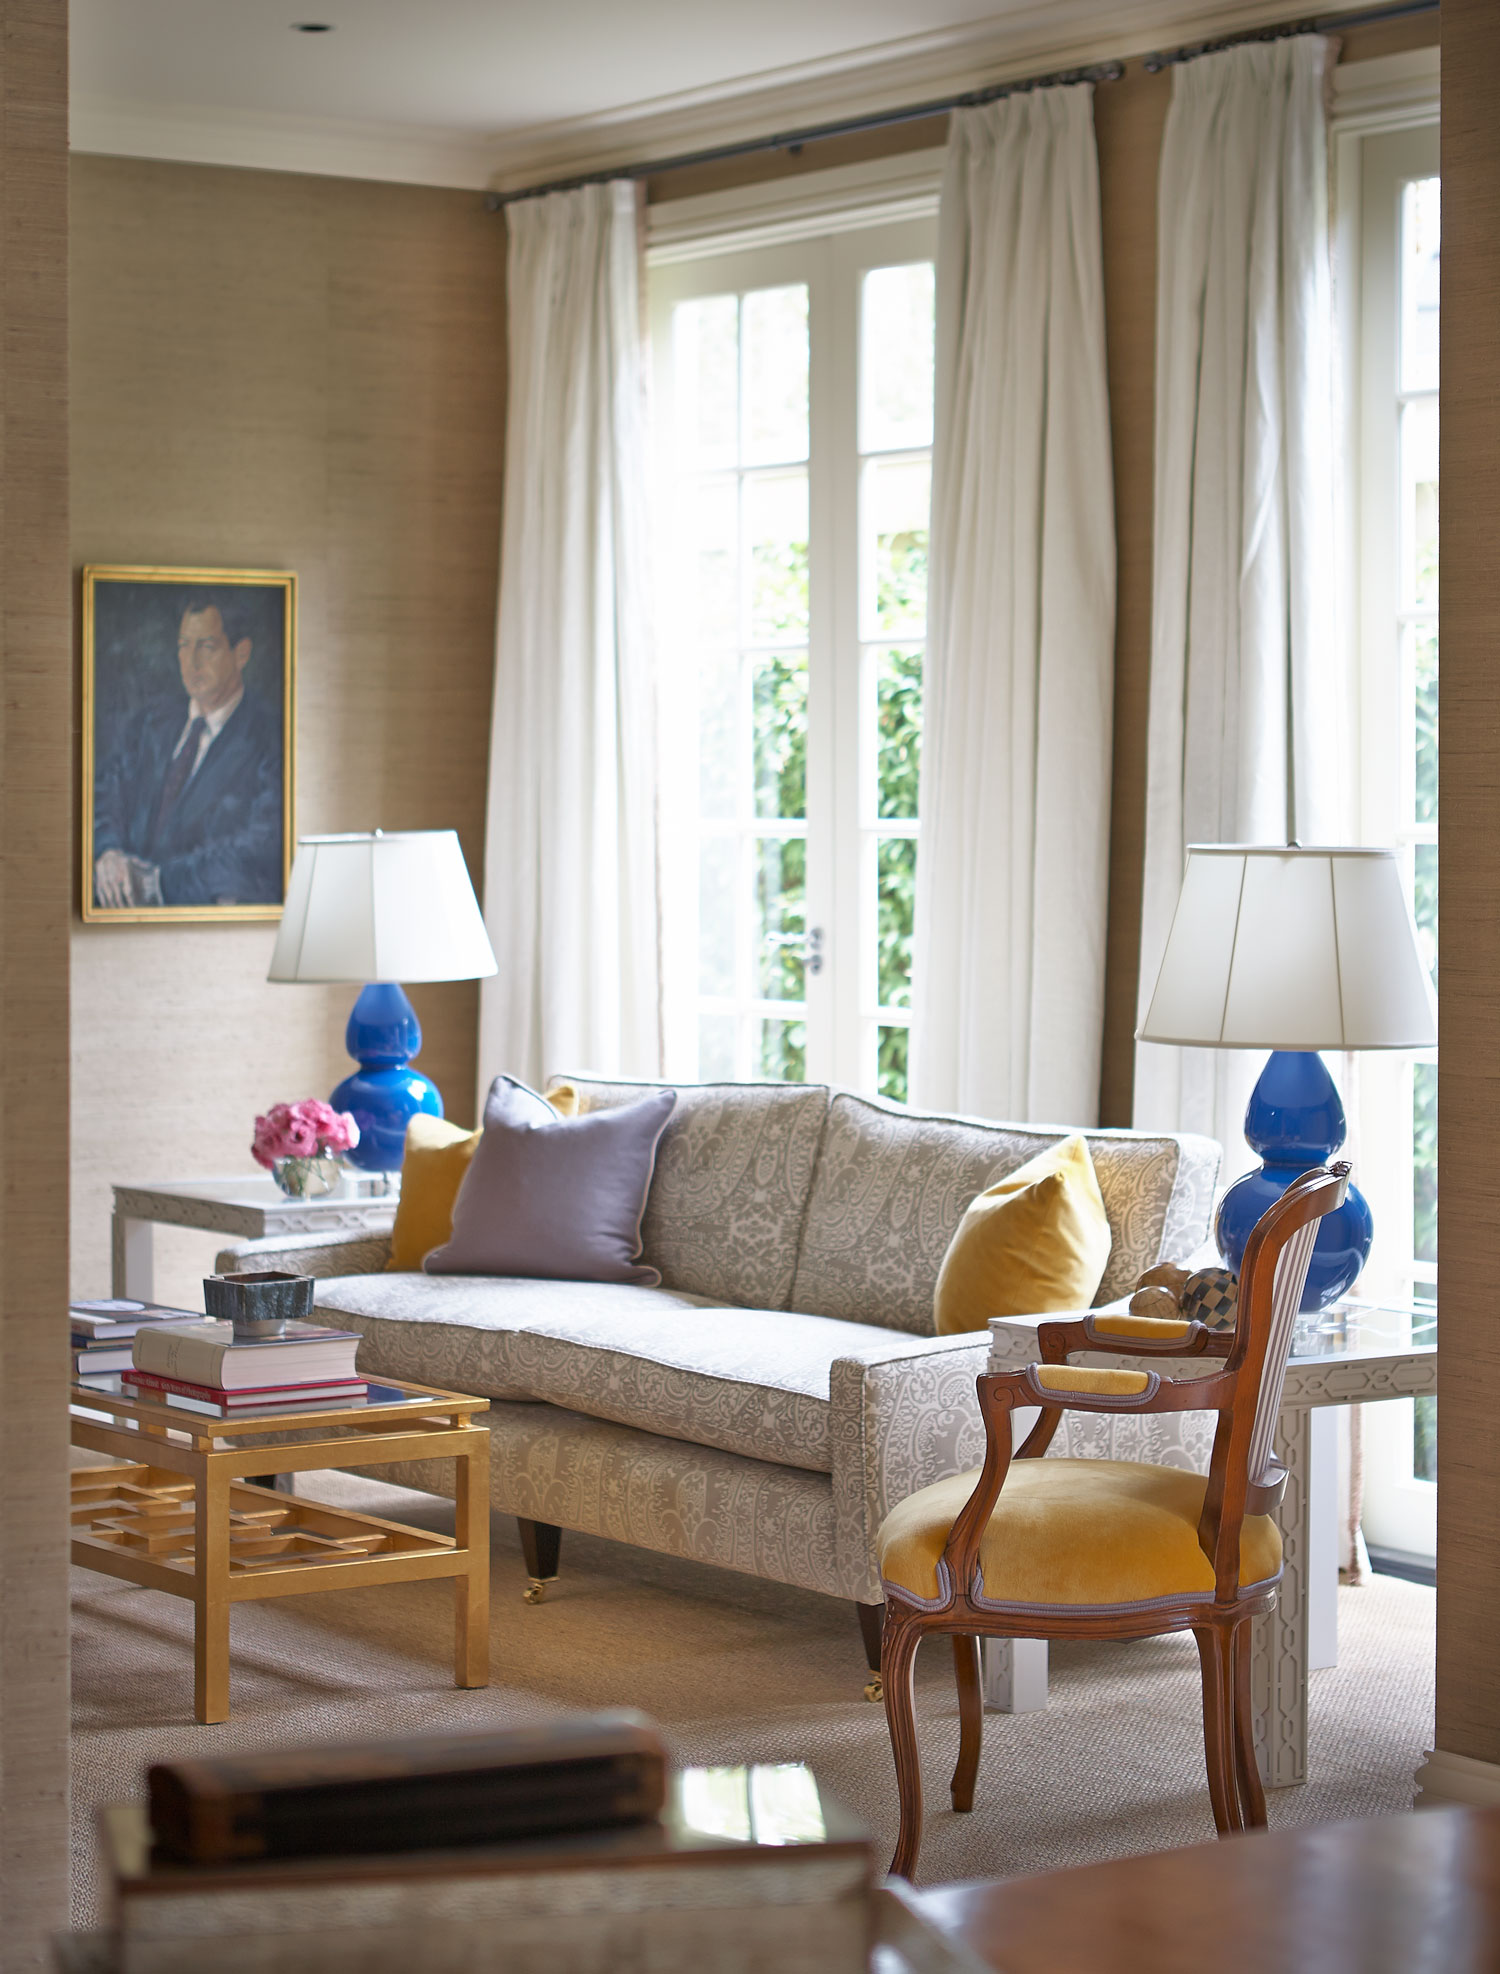 printed fabric sofa designs brown microsuede living room   interior design diane bergeron interiors